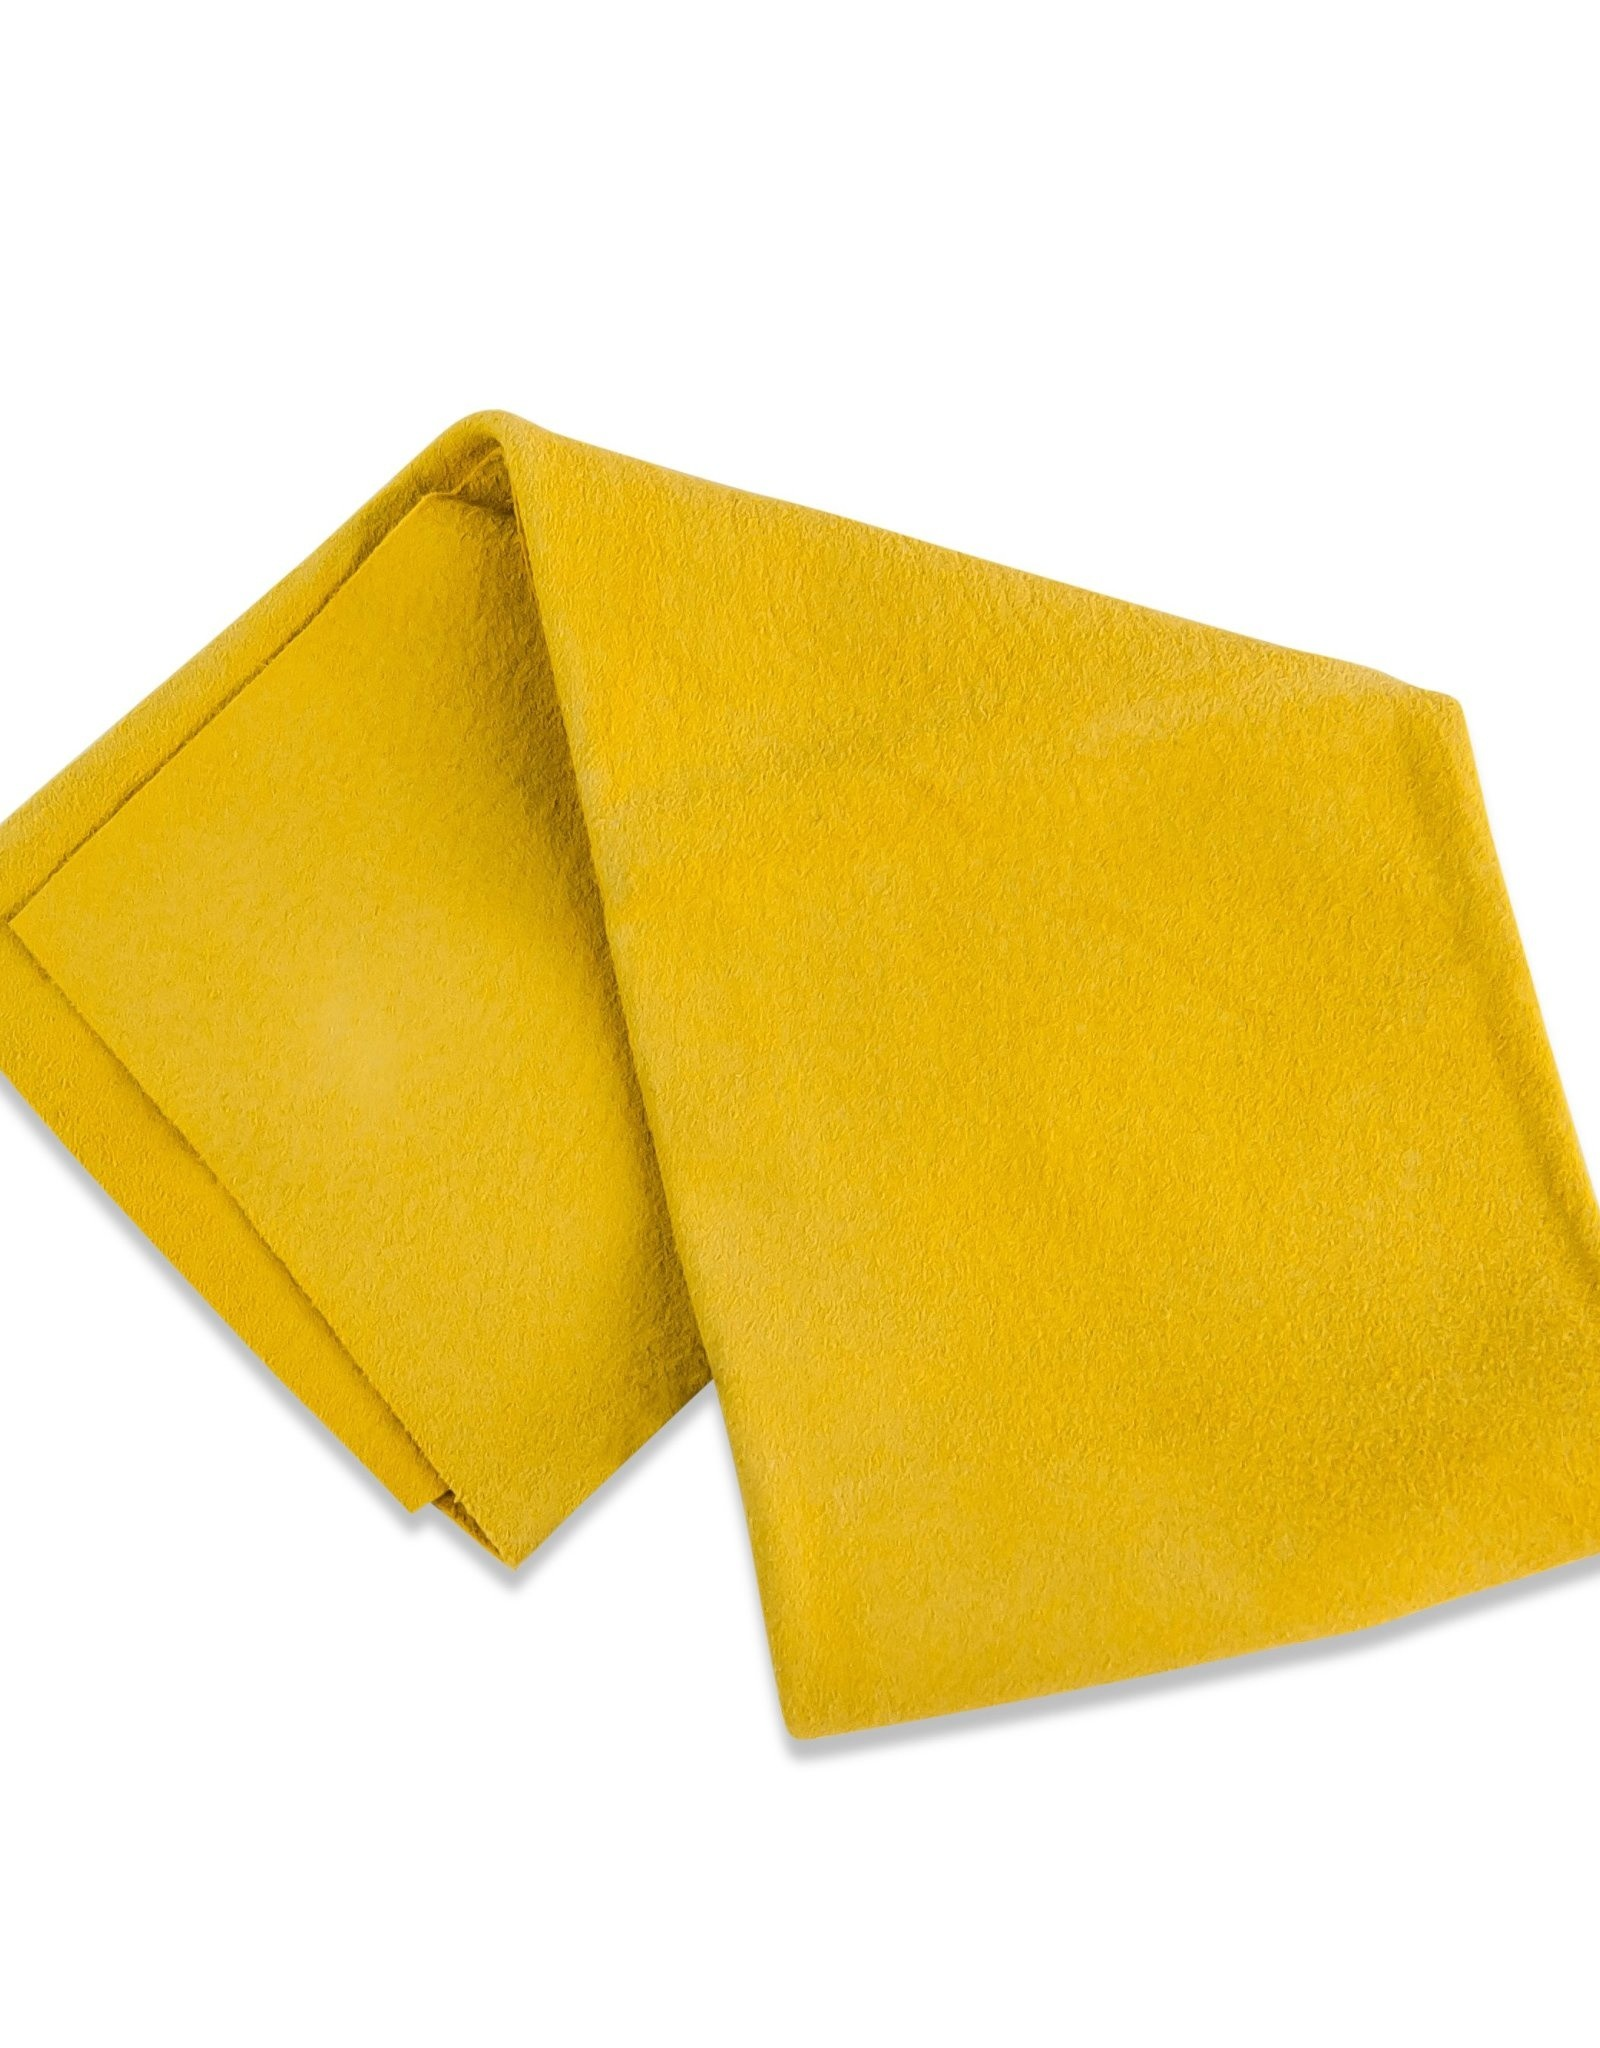 Proguard Proguard Wipe N' Dry Chamois